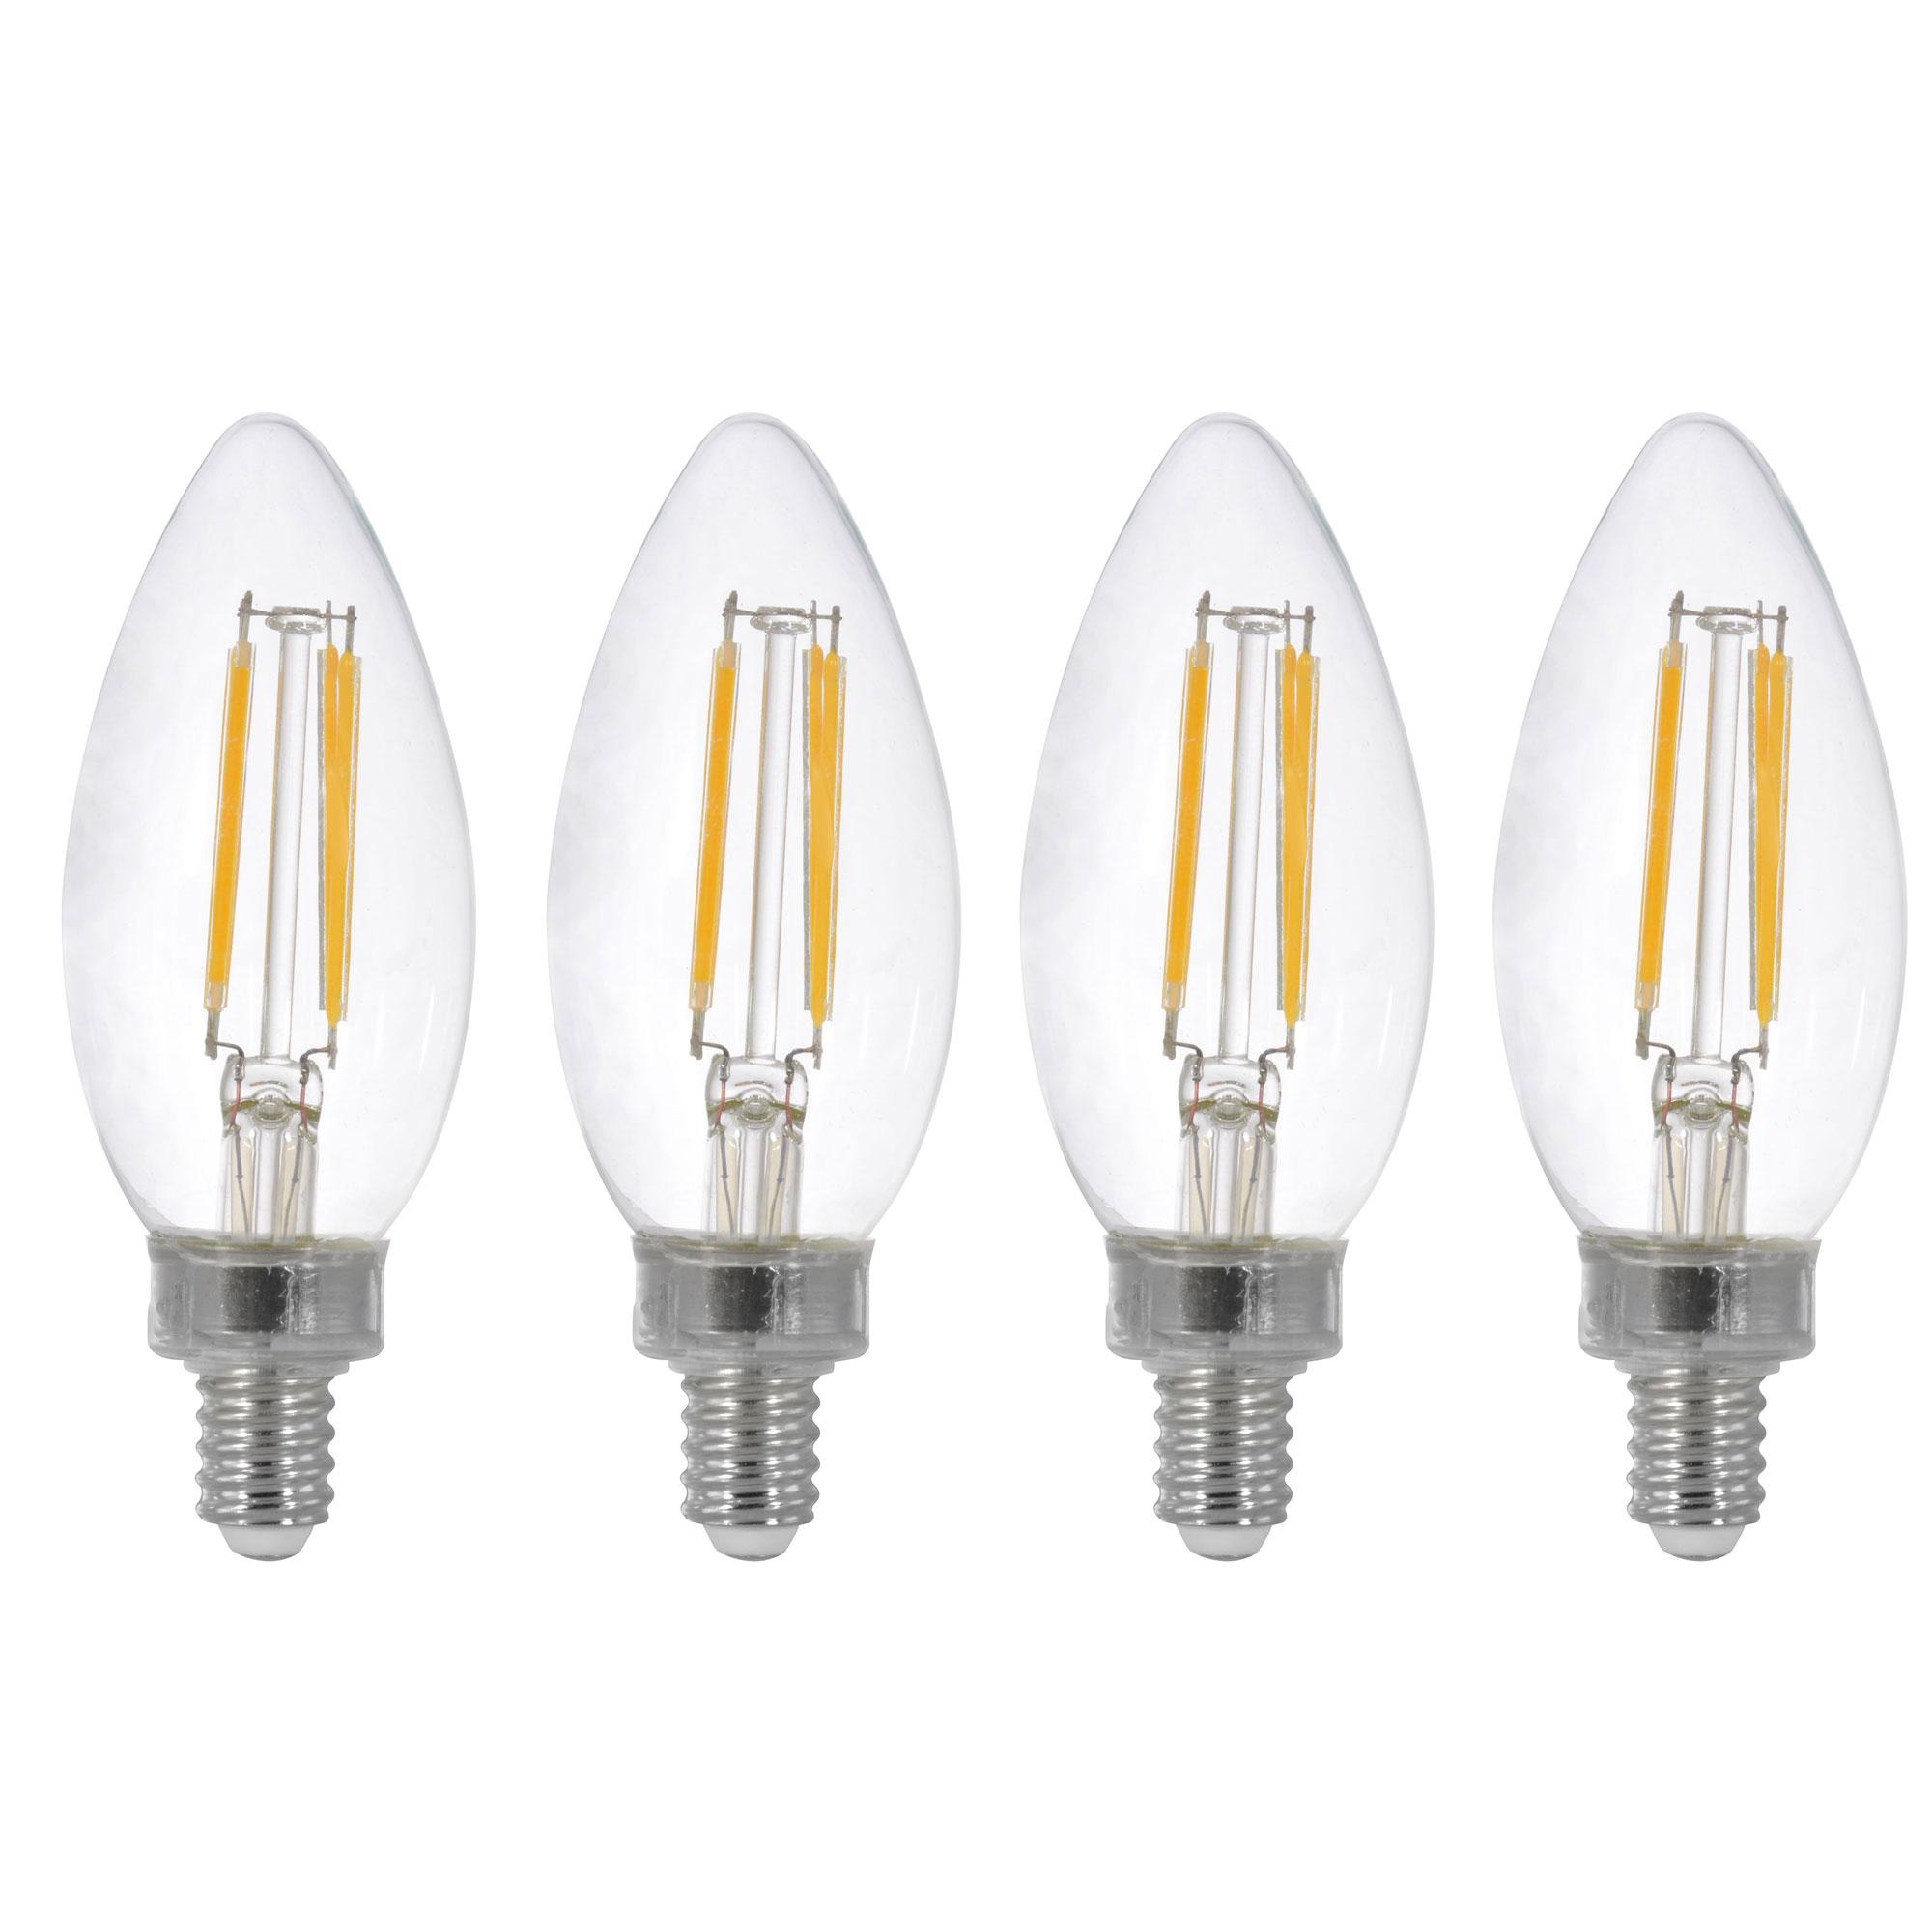 Led Light Bulb Candelabra Base: Sylvania Filament LED 40W Candelabra Base Dimmable 2700K